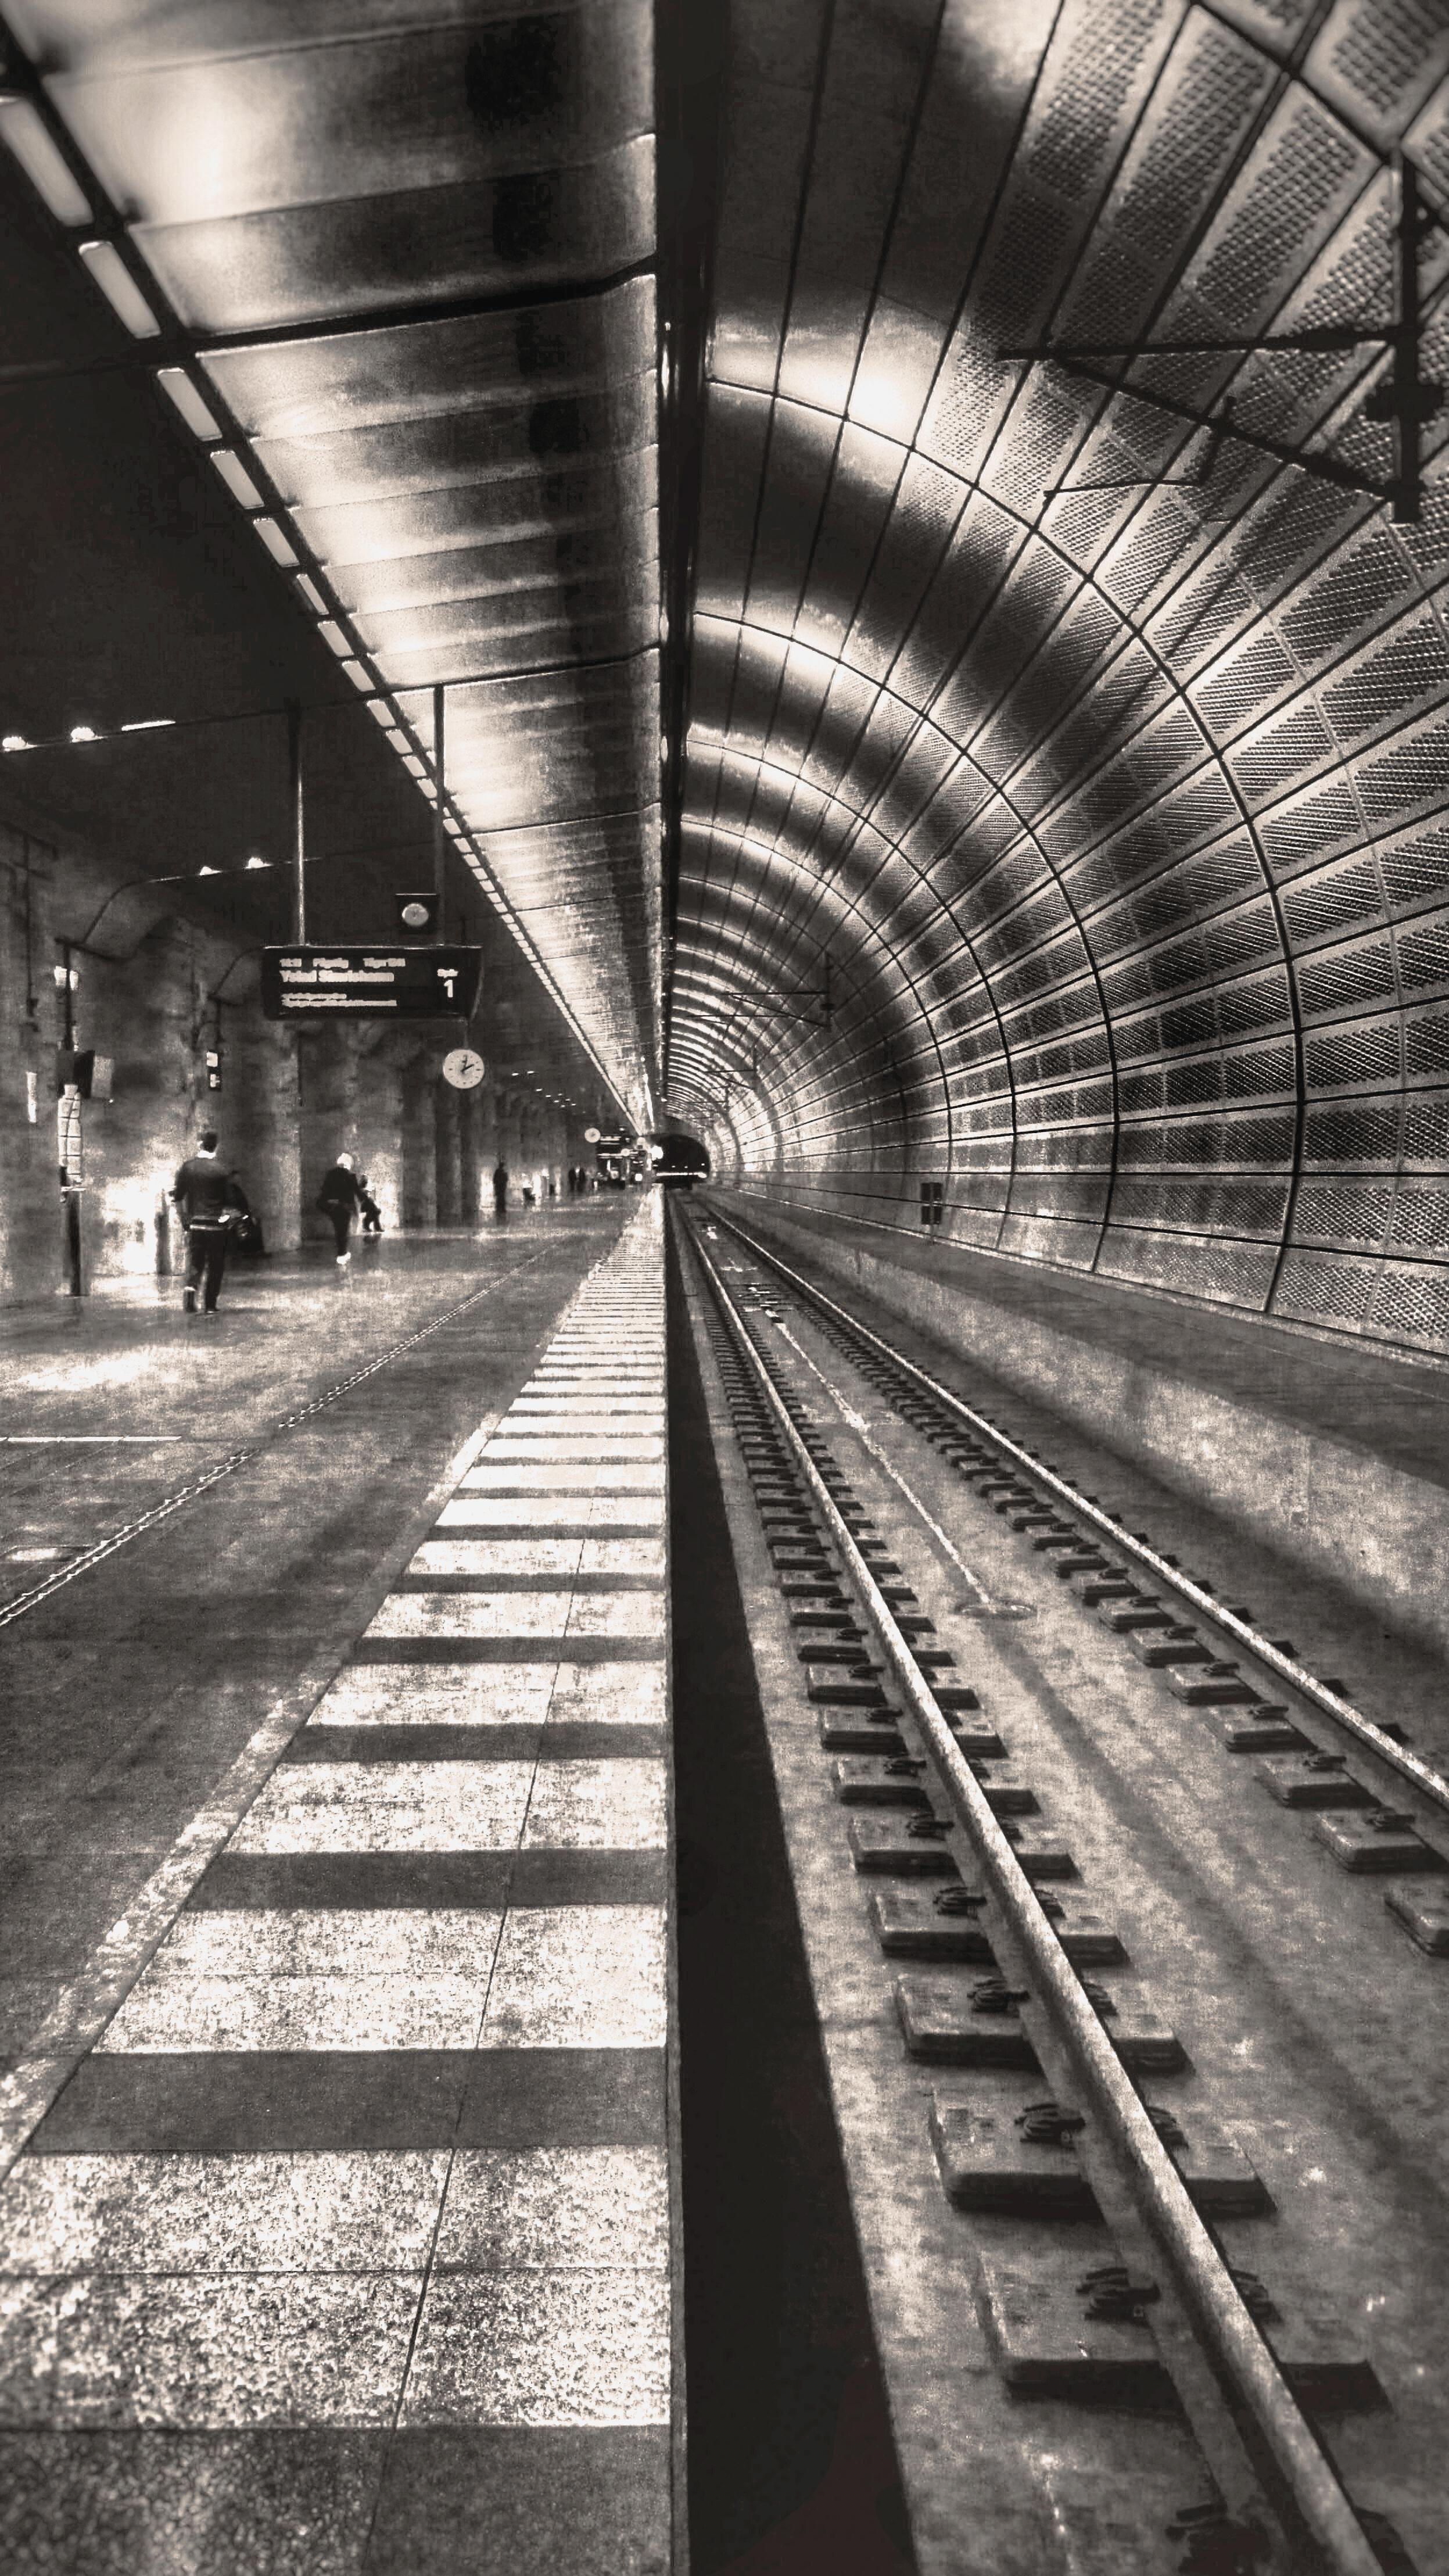 5 - Subway station - Malmö, Suède